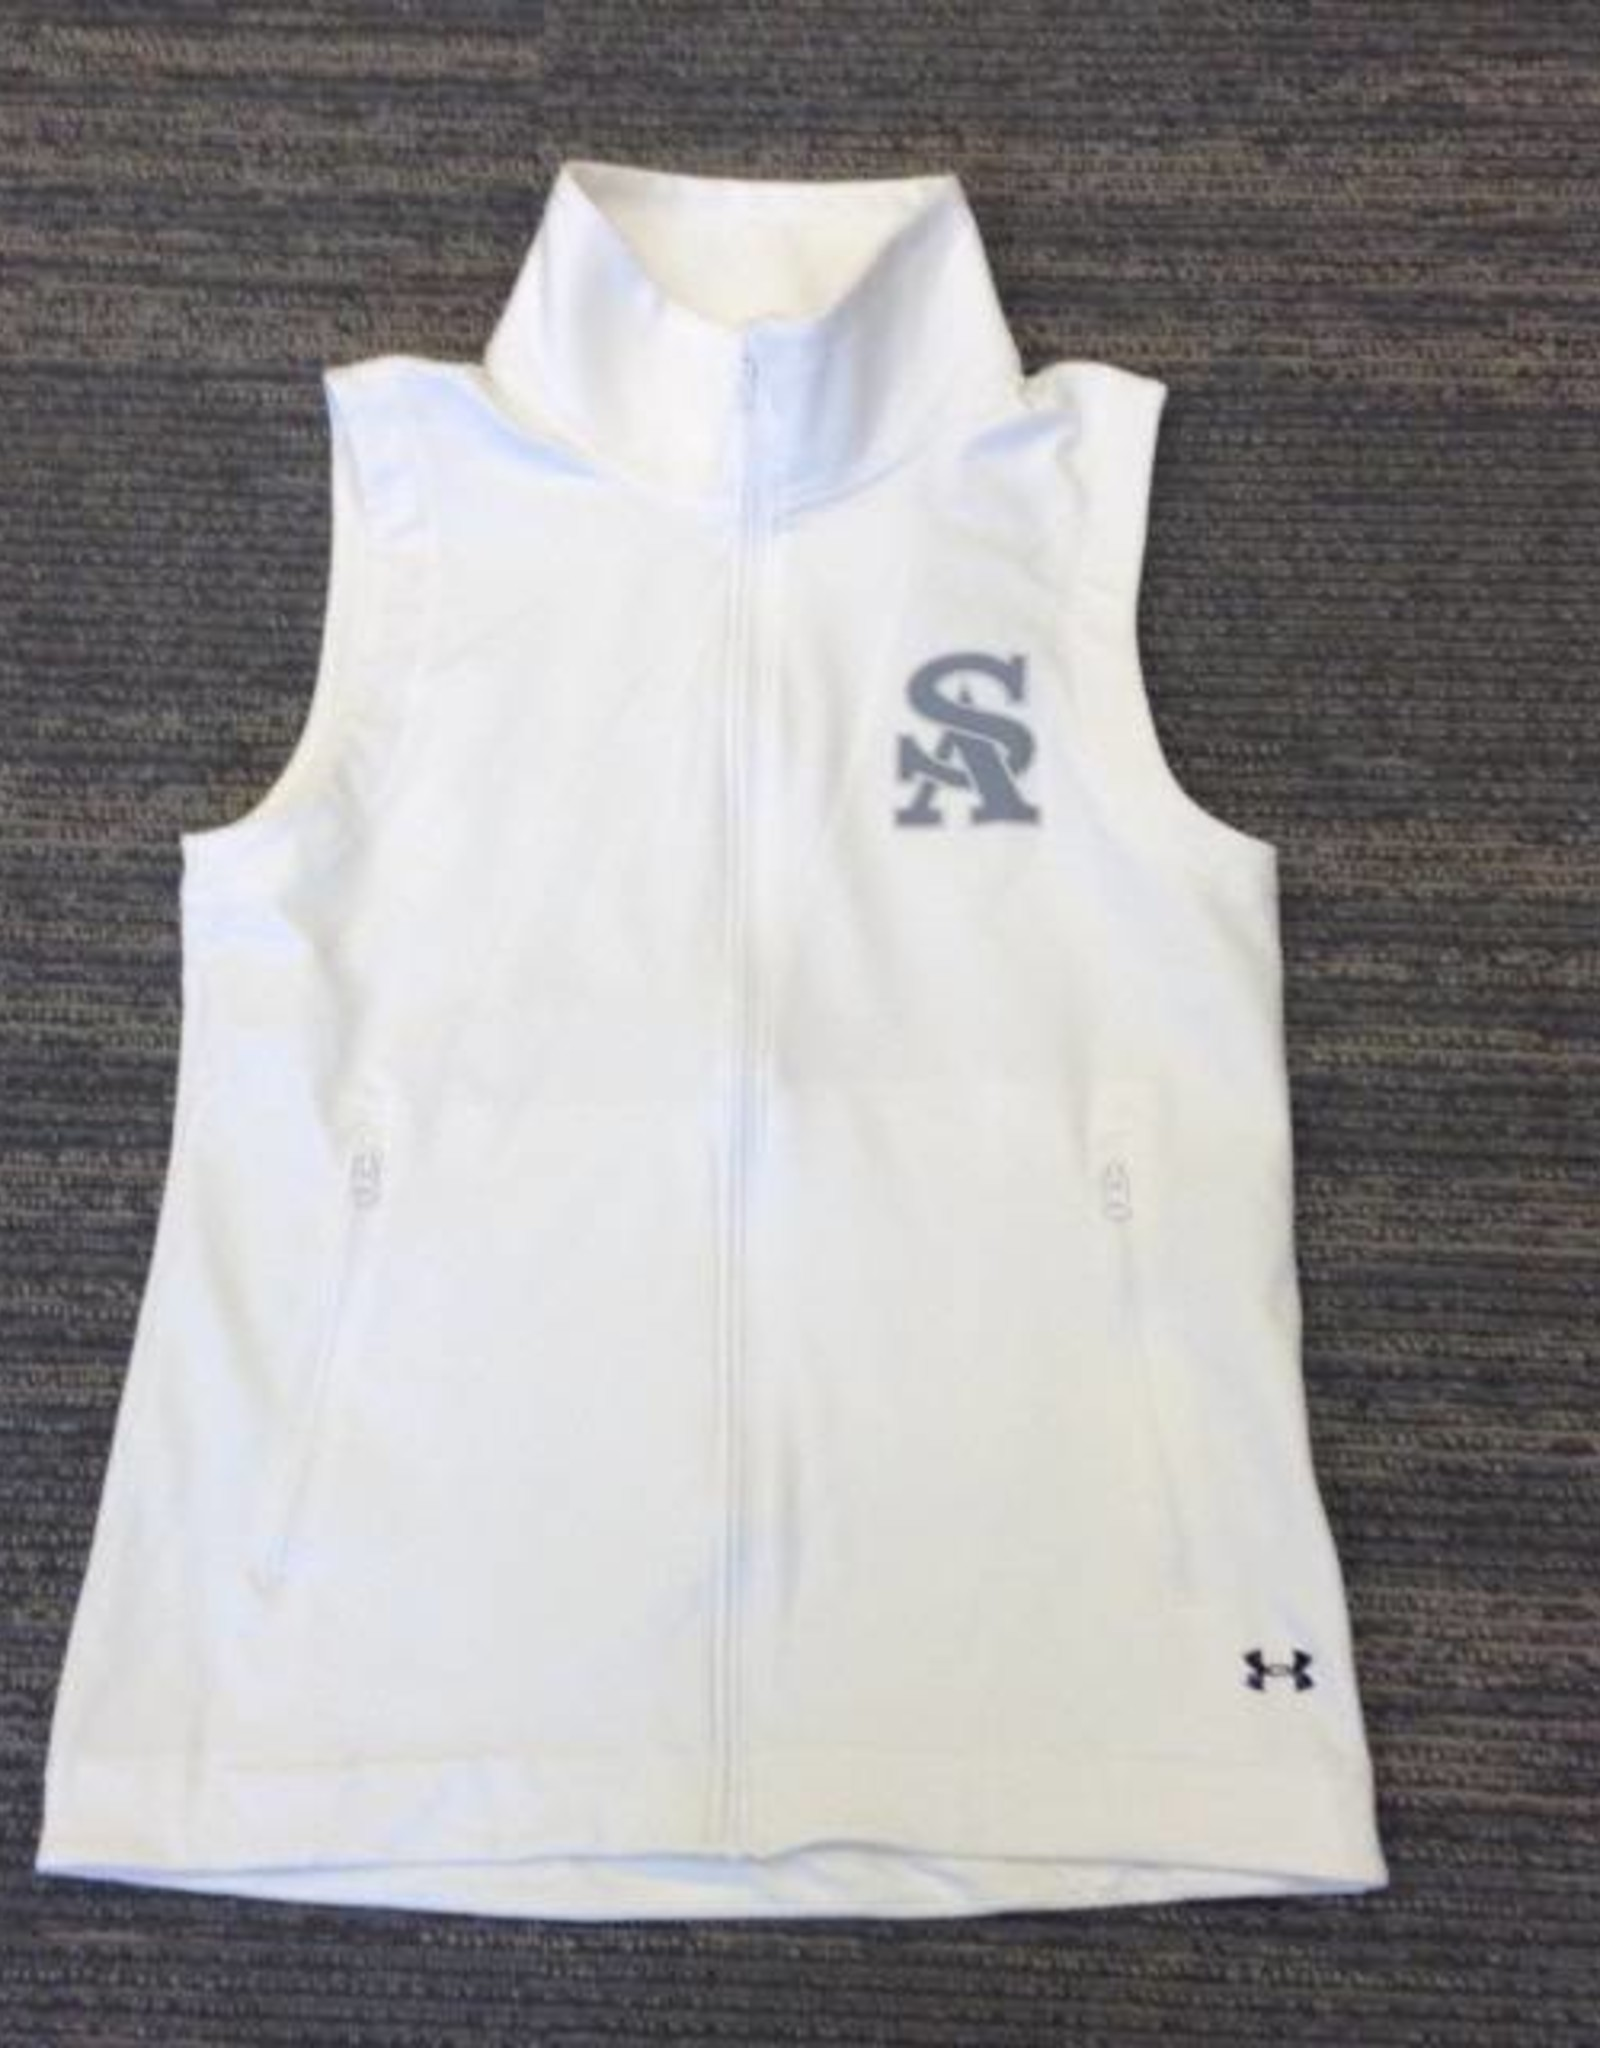 UA Women's Versa Vest